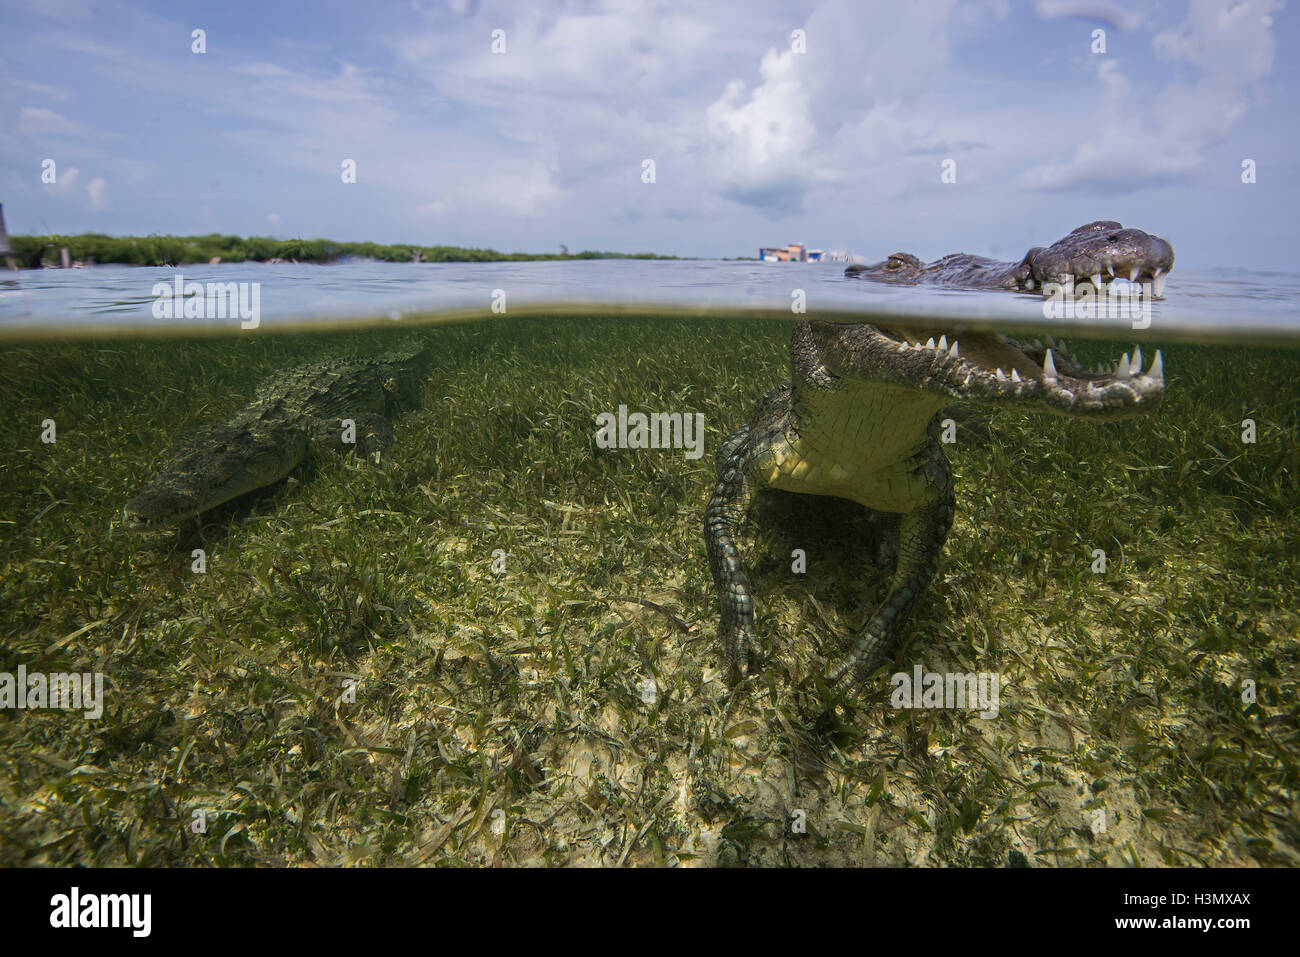 American crocodile (crodoylus acutus) in the shallows of Chinchorro Atoll, Mexico Stock Photo